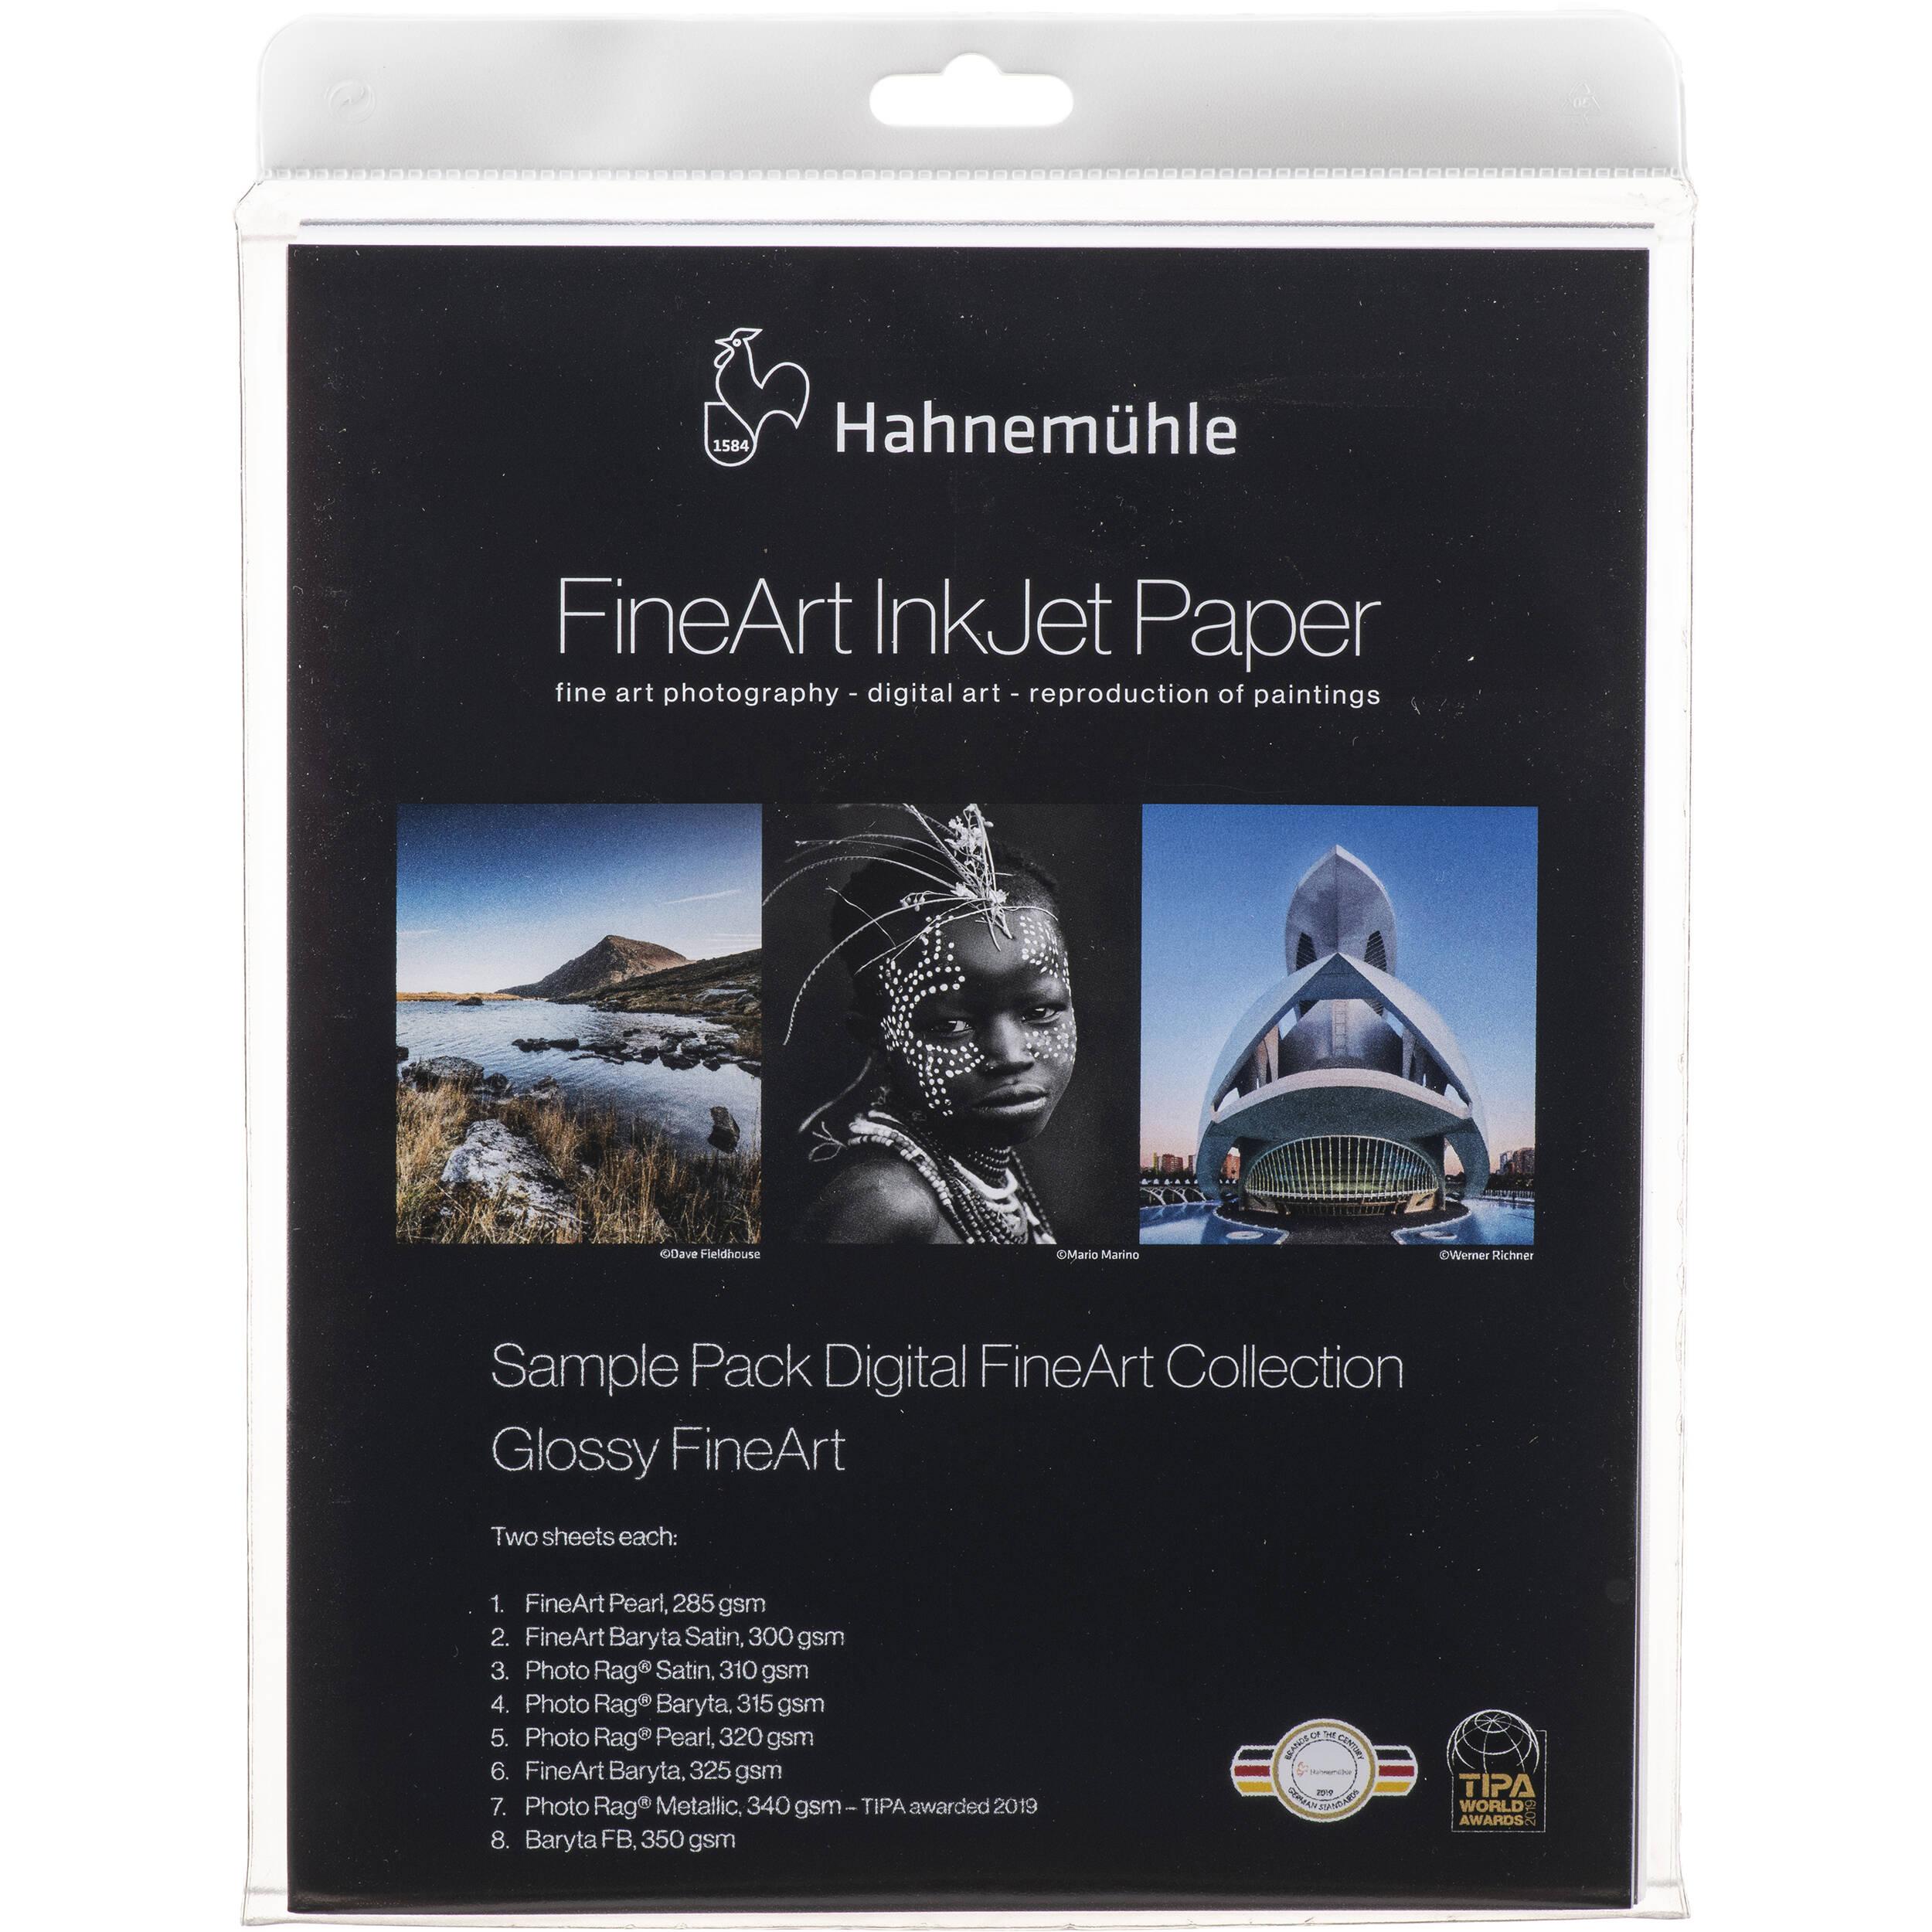 Hahnemühle FineArt Glossy Inkjet Paper Sample Pack 11640308 B&H